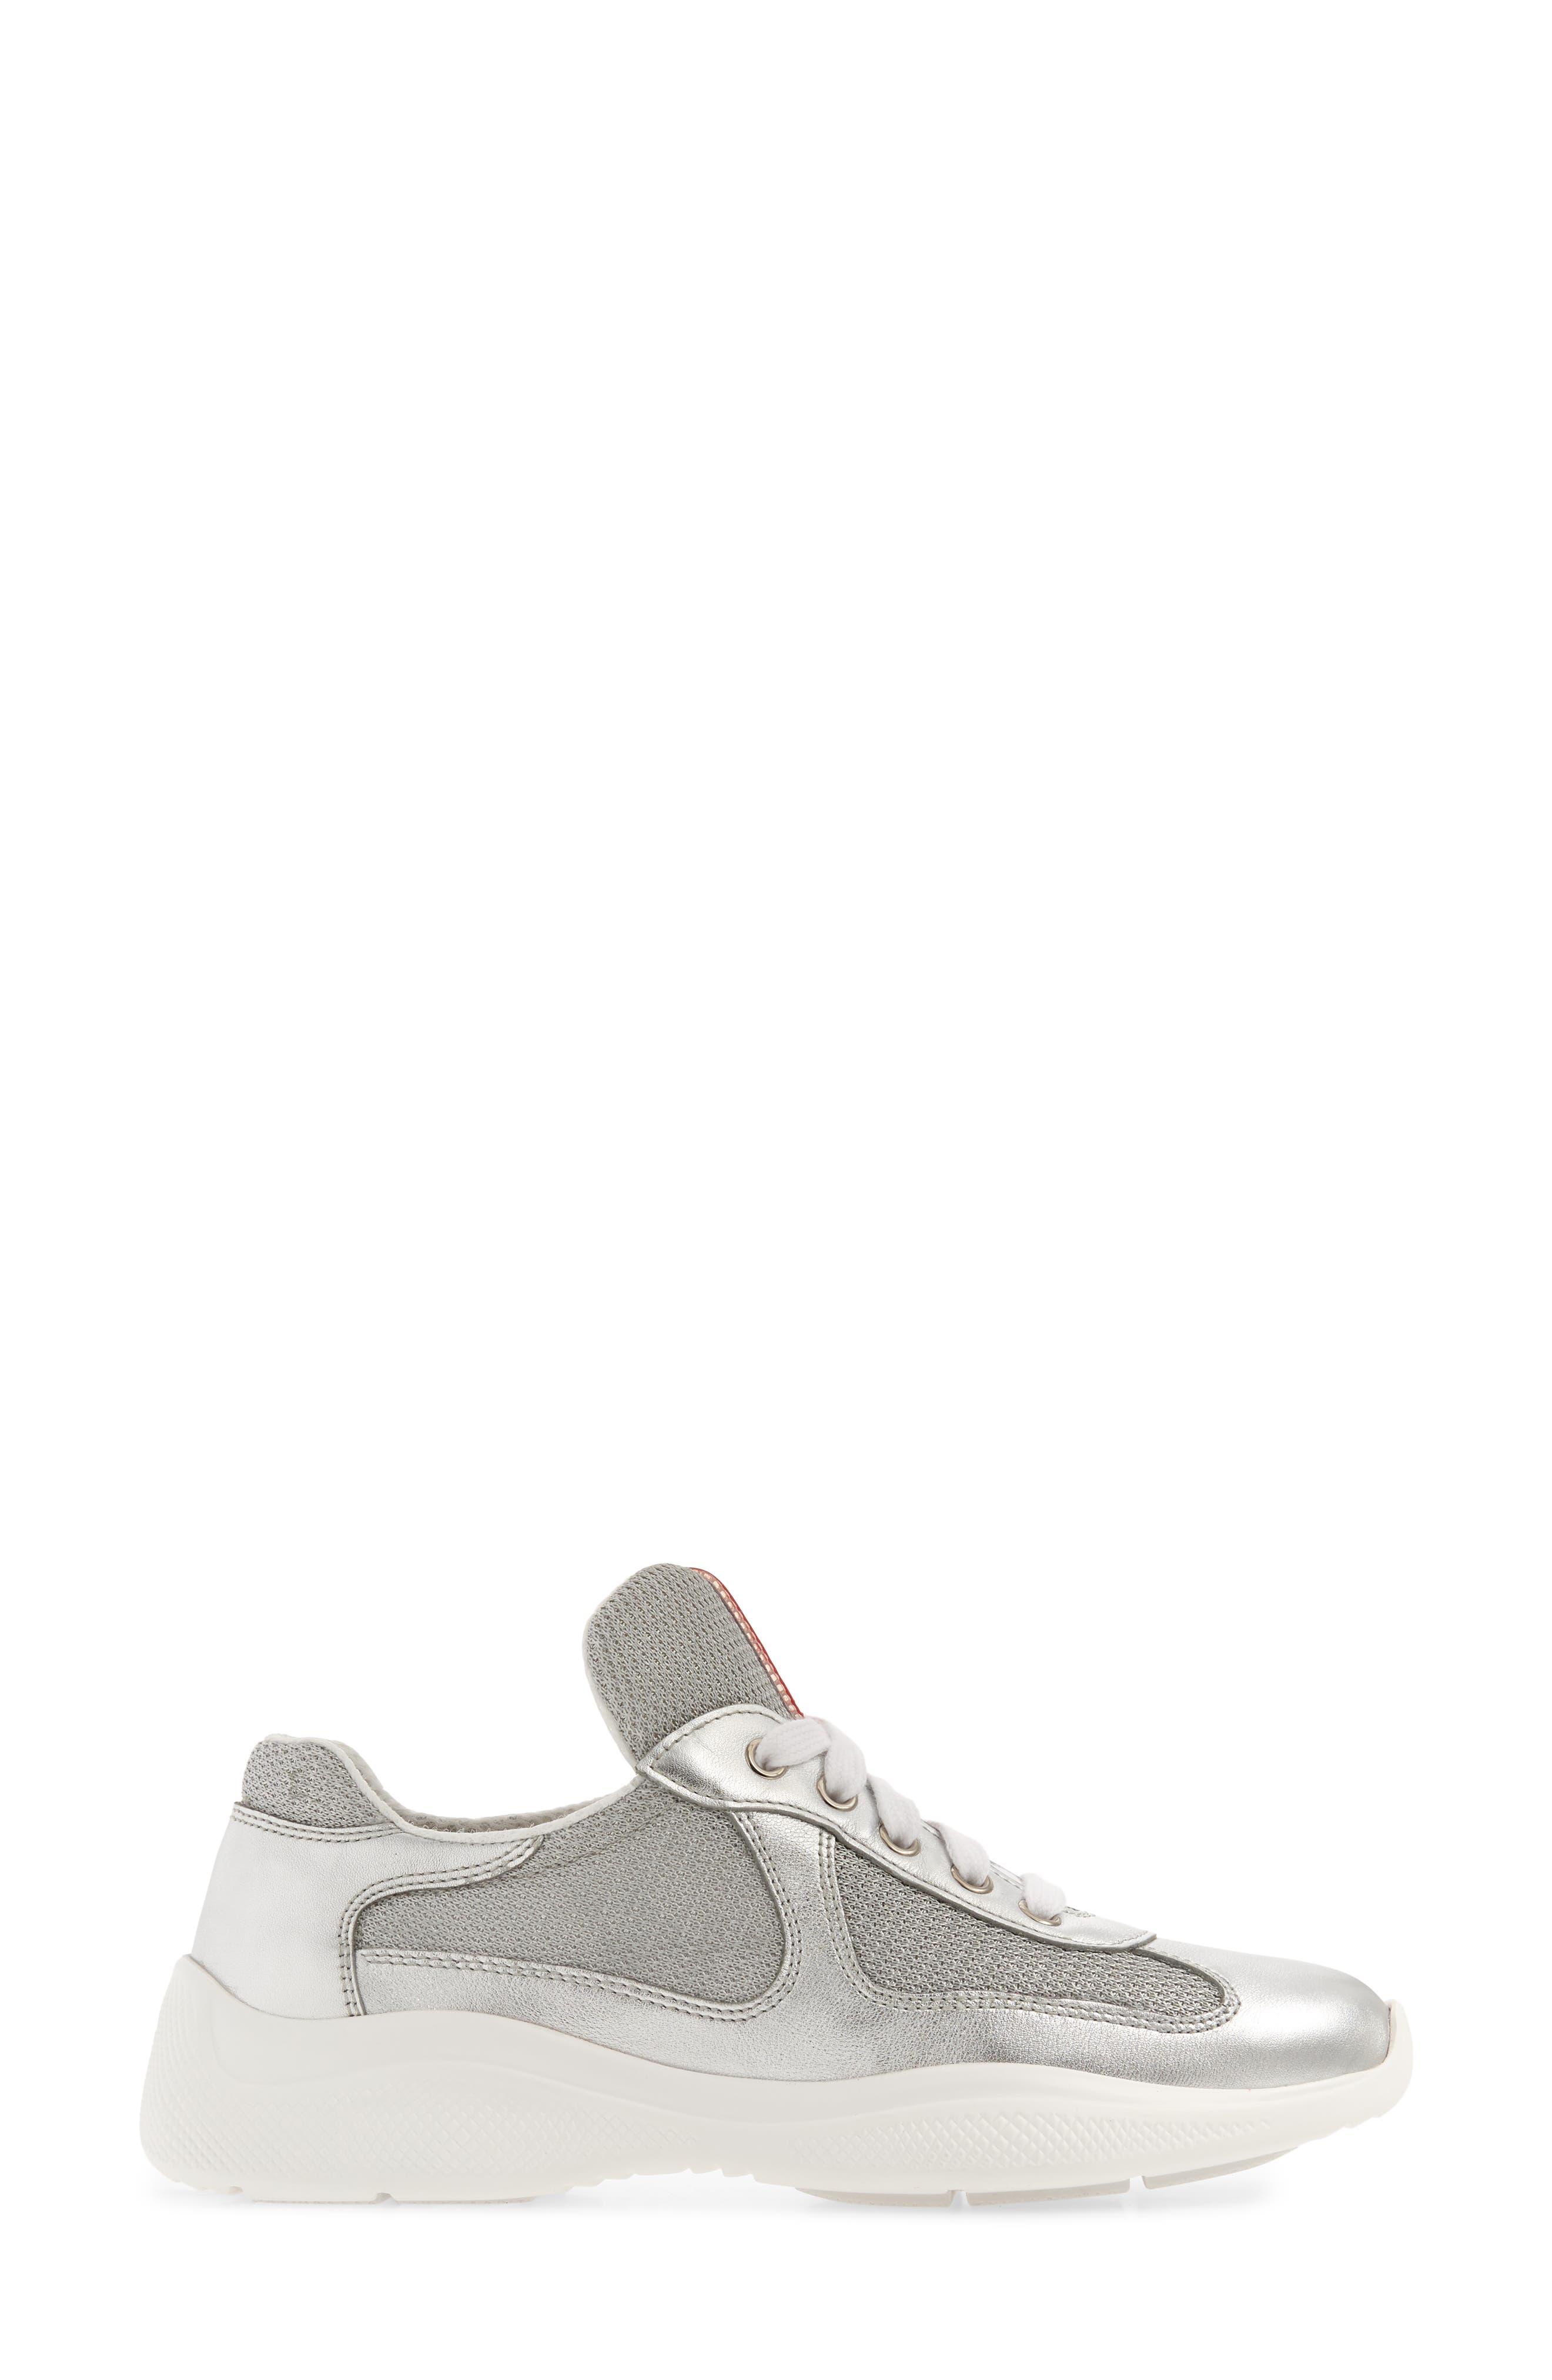 Low-Top Sneaker,                             Alternate thumbnail 3, color,                             METALLIC SILVER